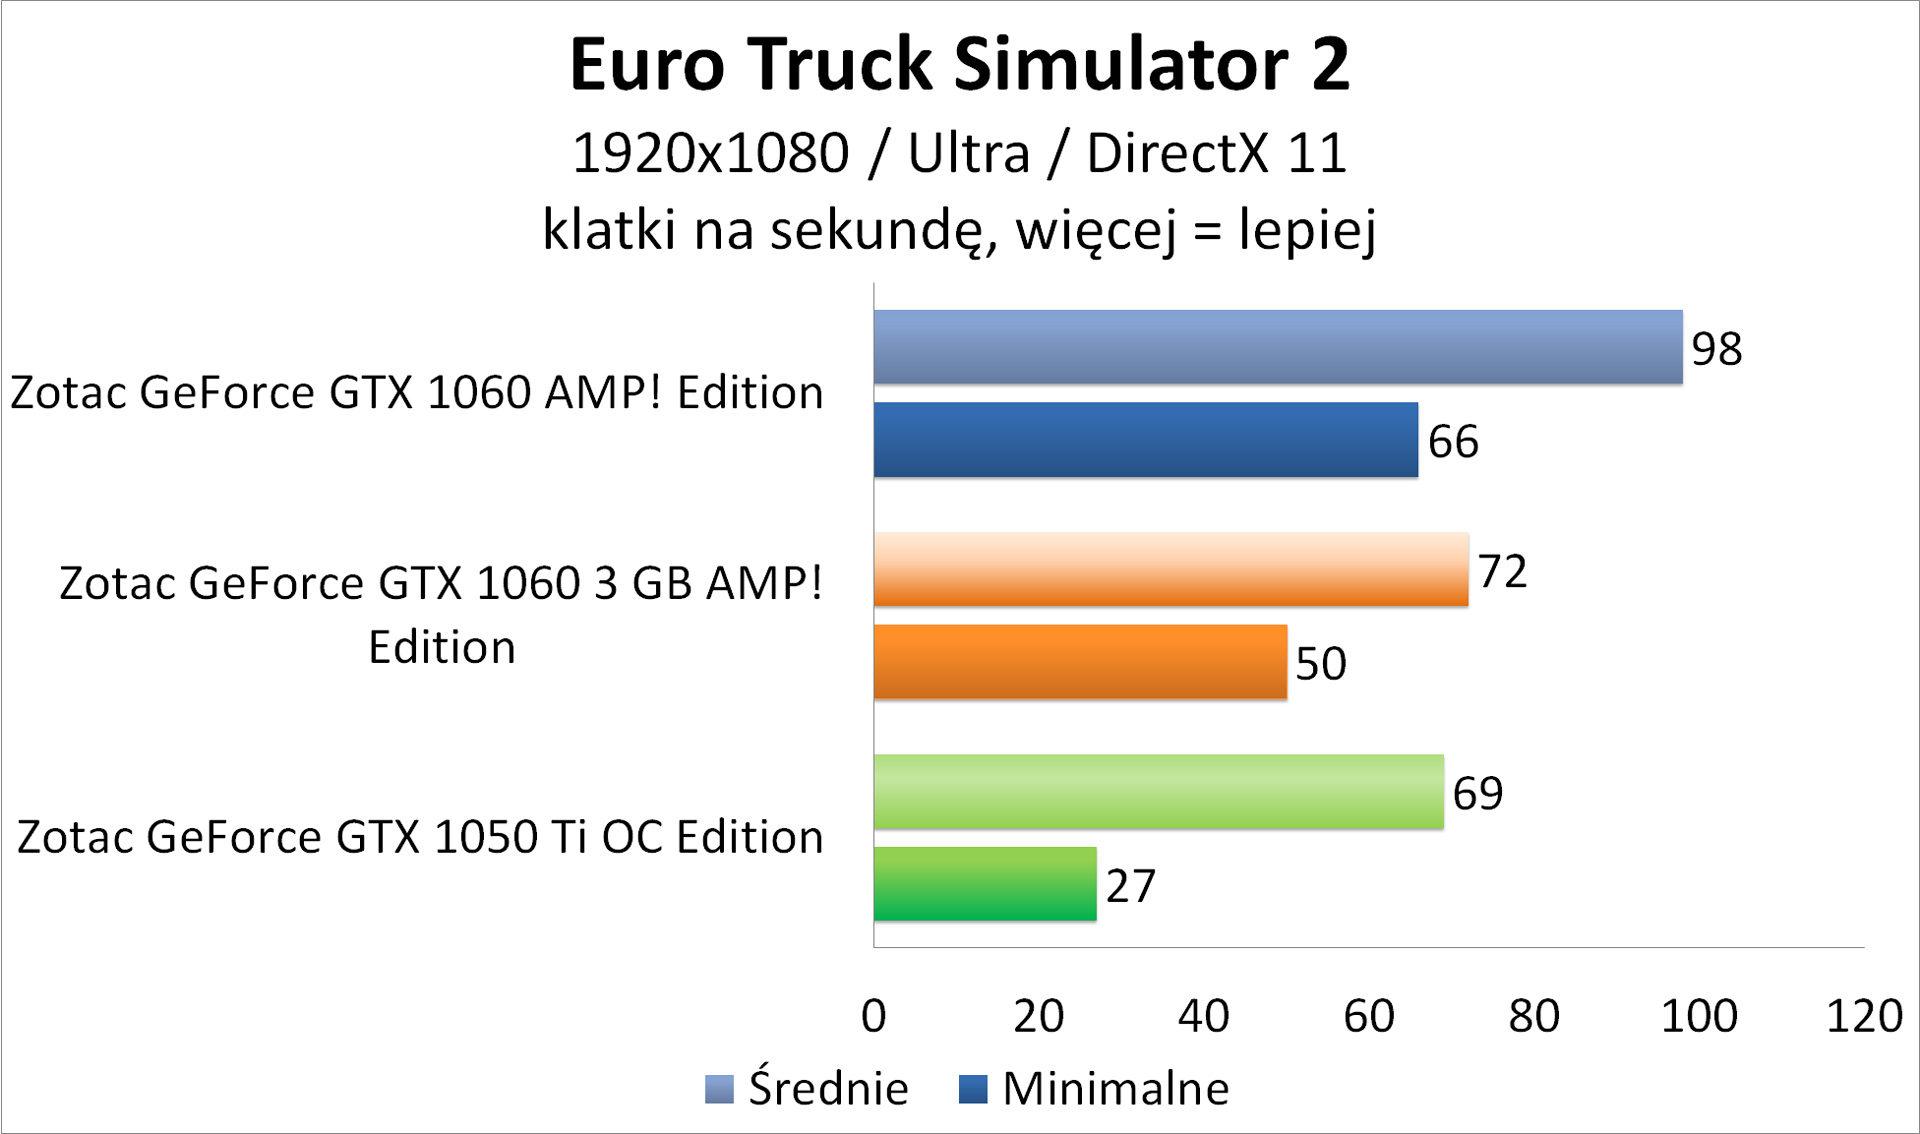 Zotac GeForce GTX 1050 Ti OC Edition - Euro Truck Simulator 2